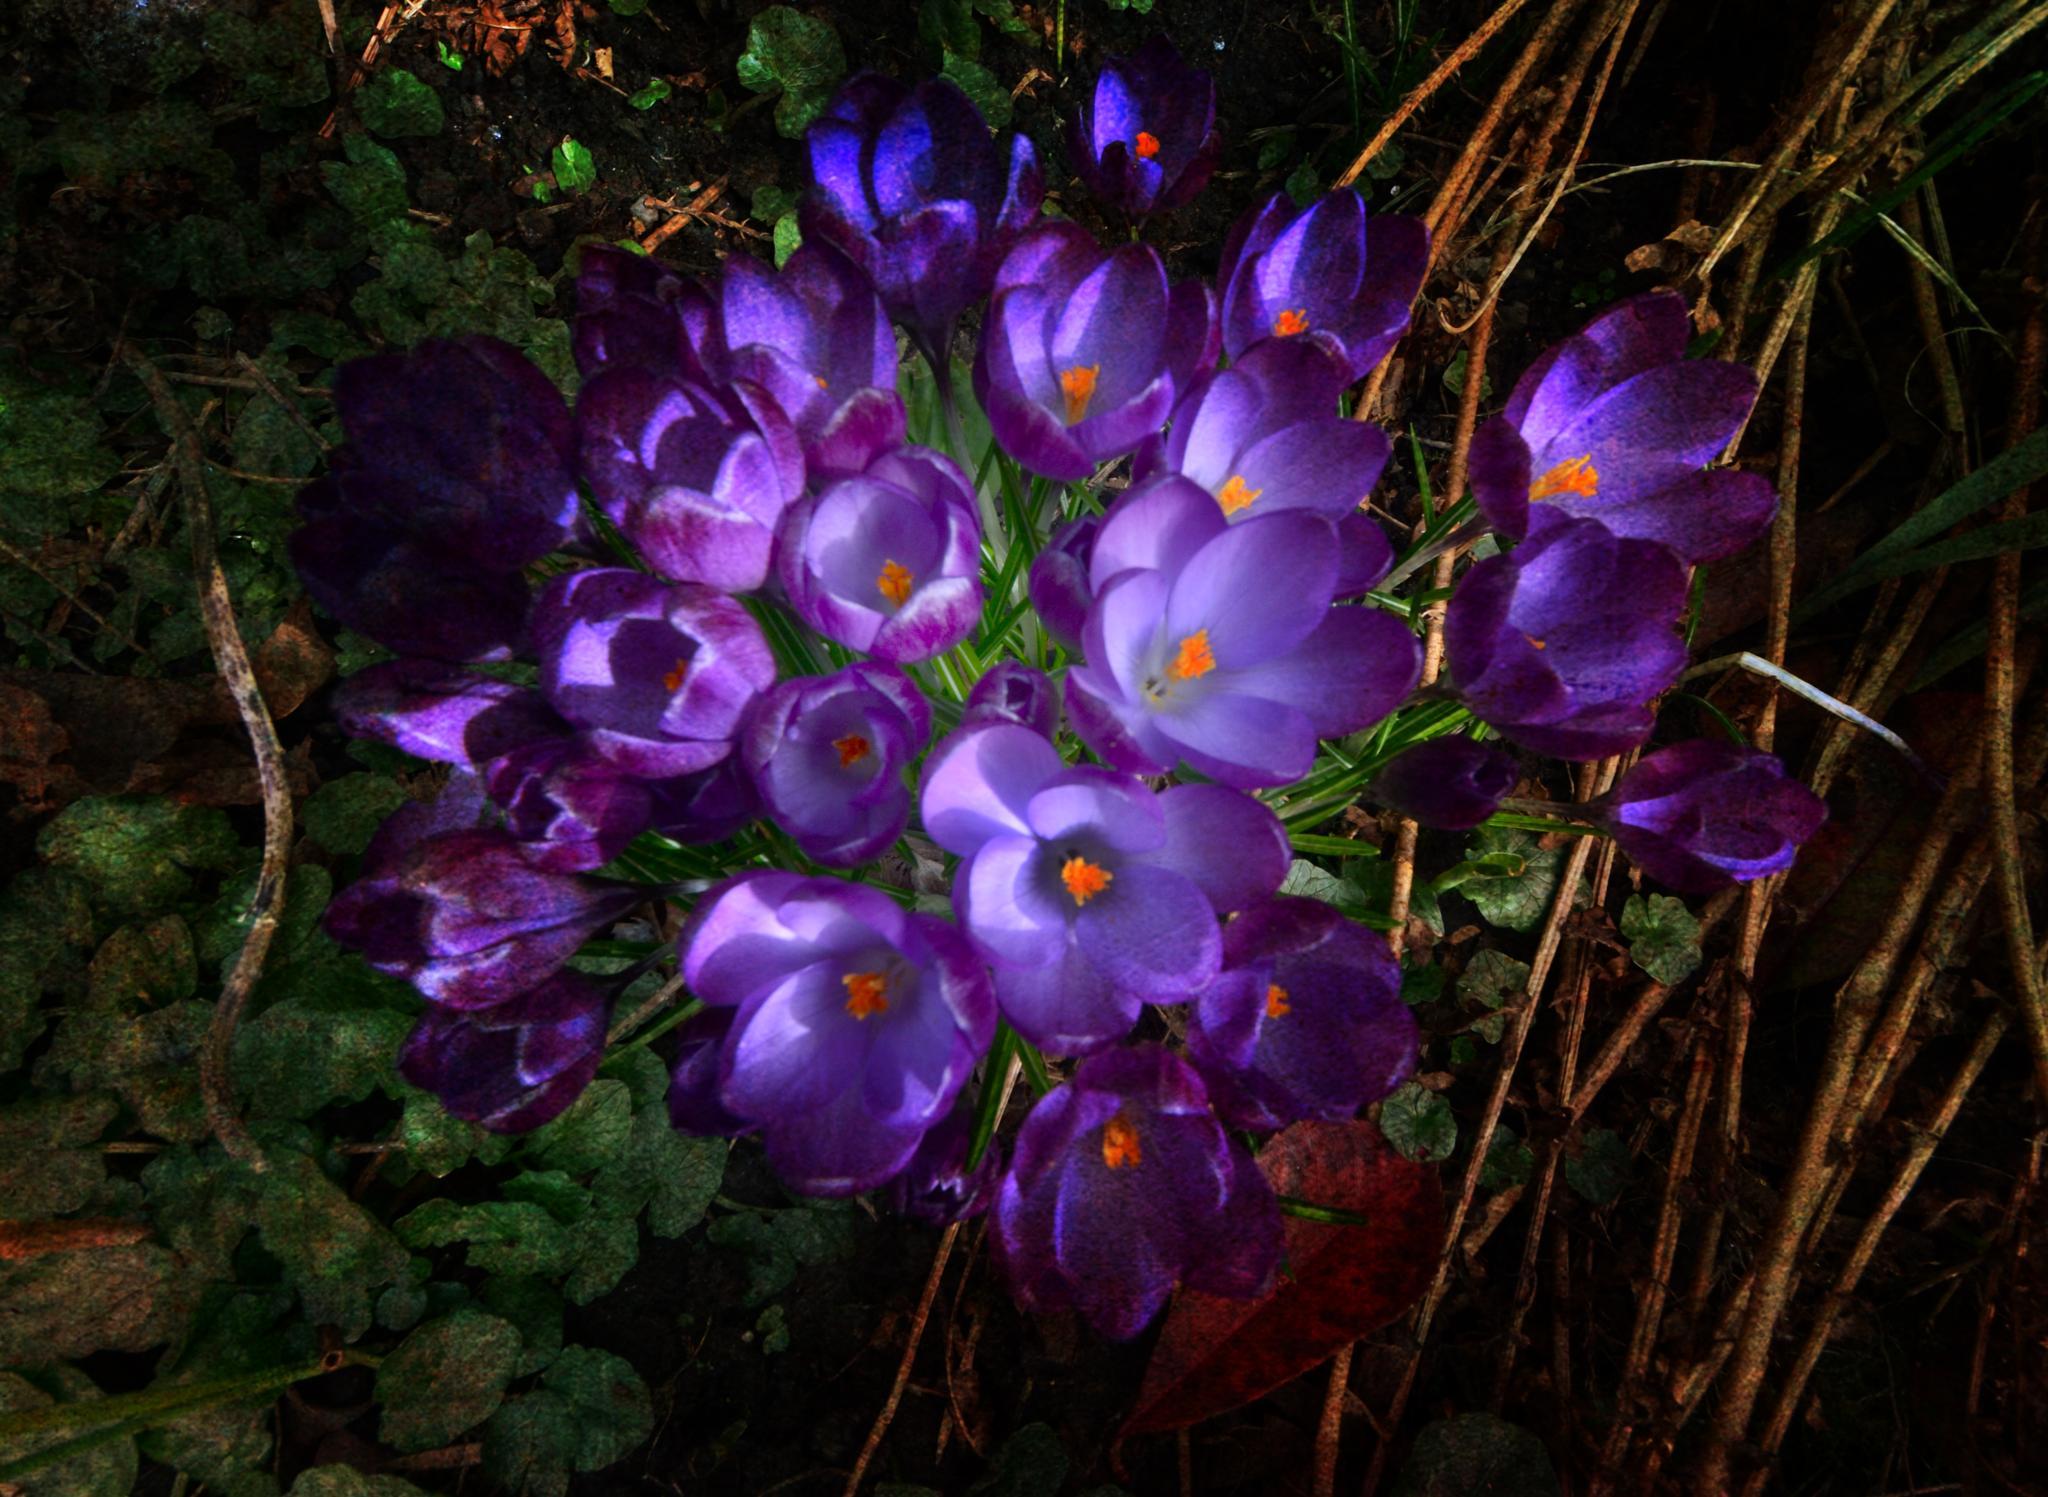 Flowers in my garden by ValerieBakerPhotographer